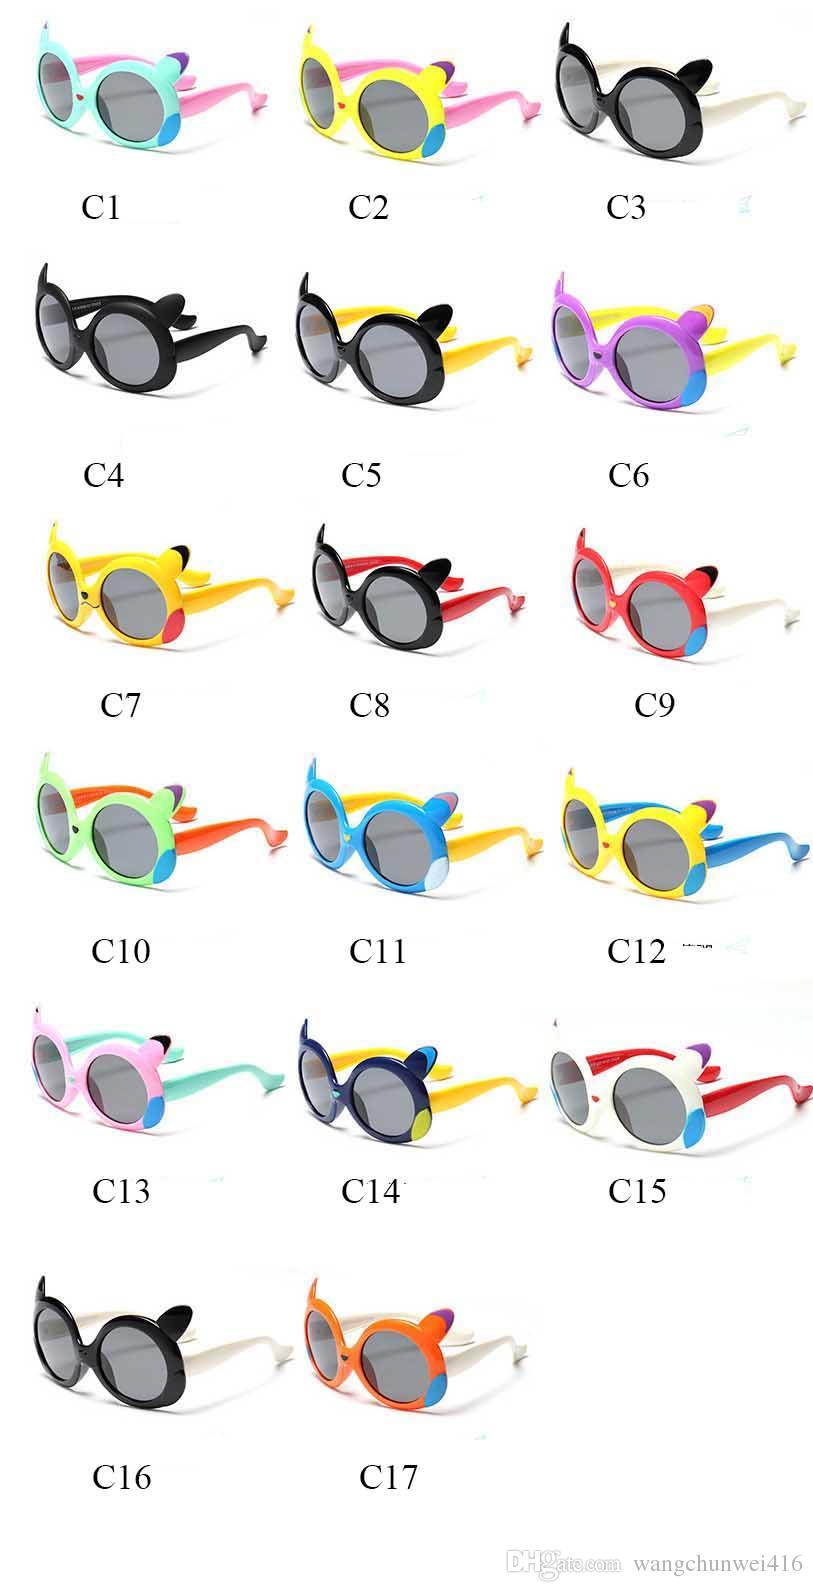 Fashion Kids Sunglasses Polarized Baby Boy Girls Sun Glasses Child Sunglass new cool Infant Oculos Shades UV400 2018 Brand Design